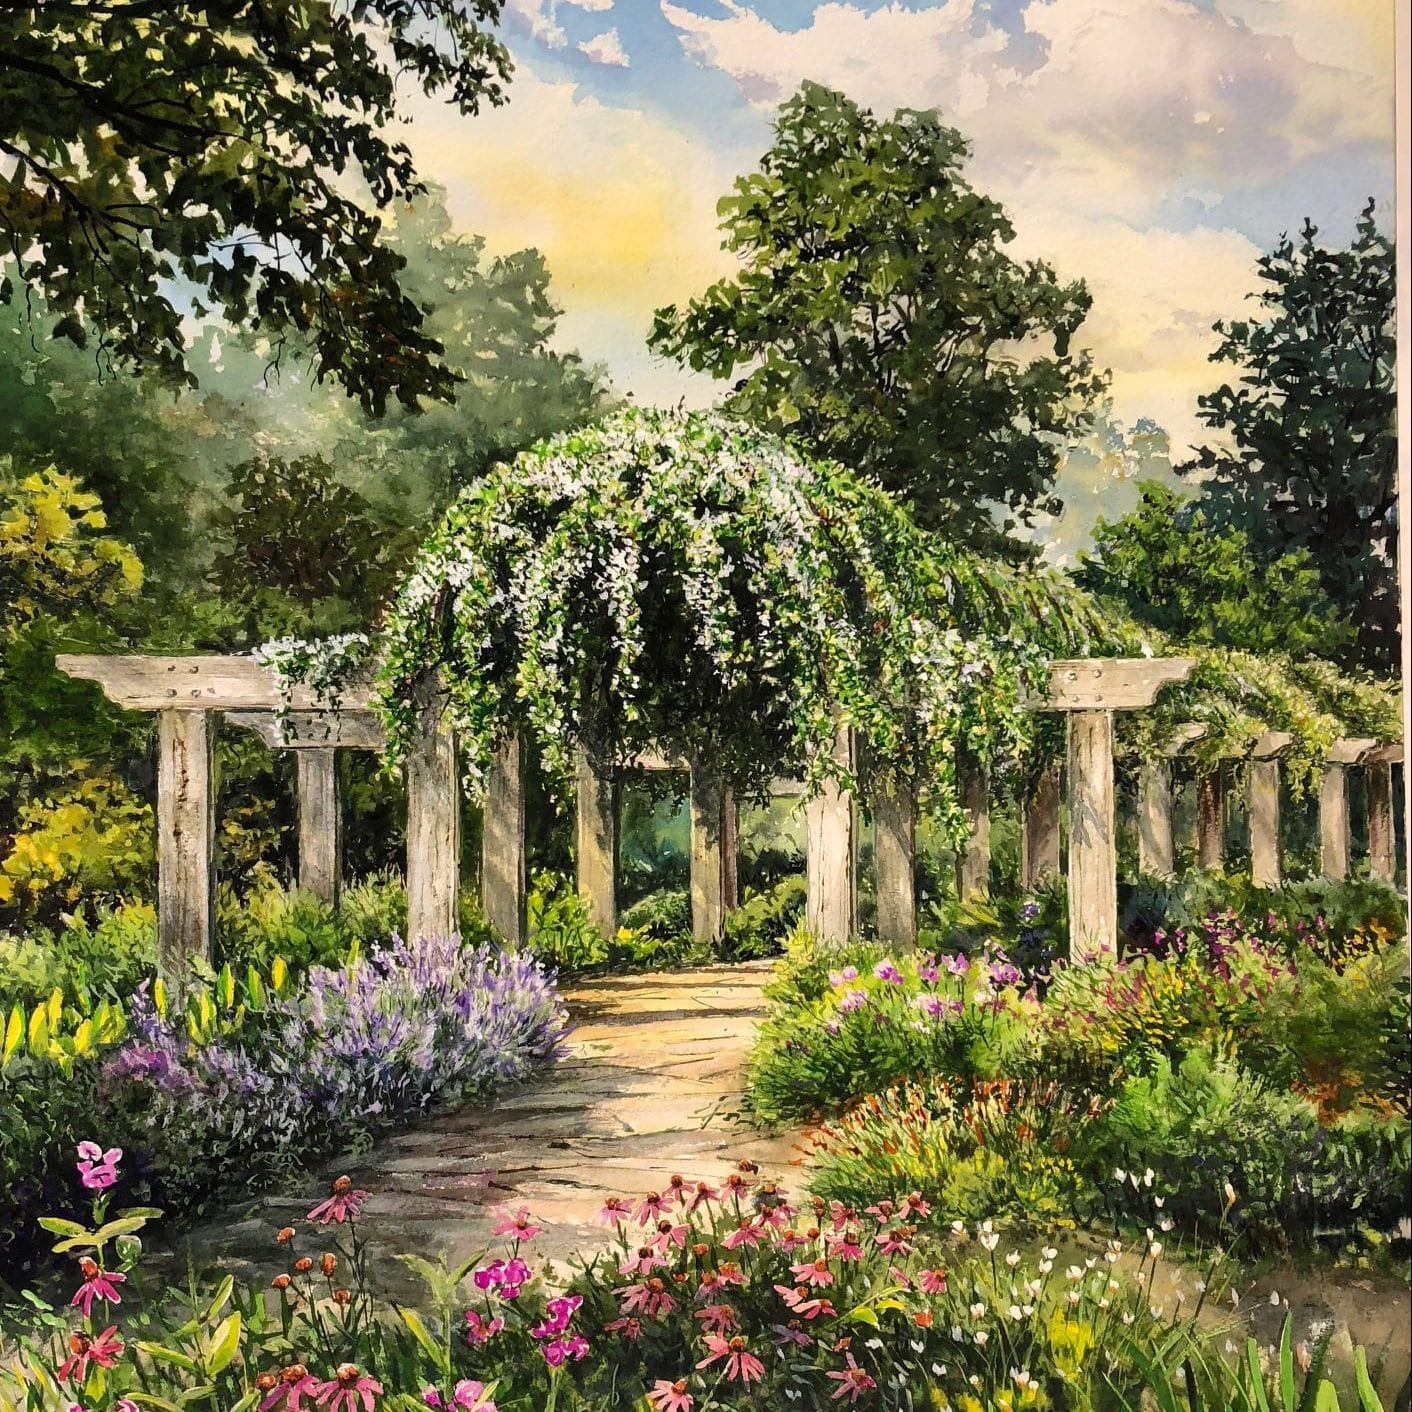 https://greensborobeautiful.org/wp-content/media/mangum-arboretum-e1623306082634.jpeg